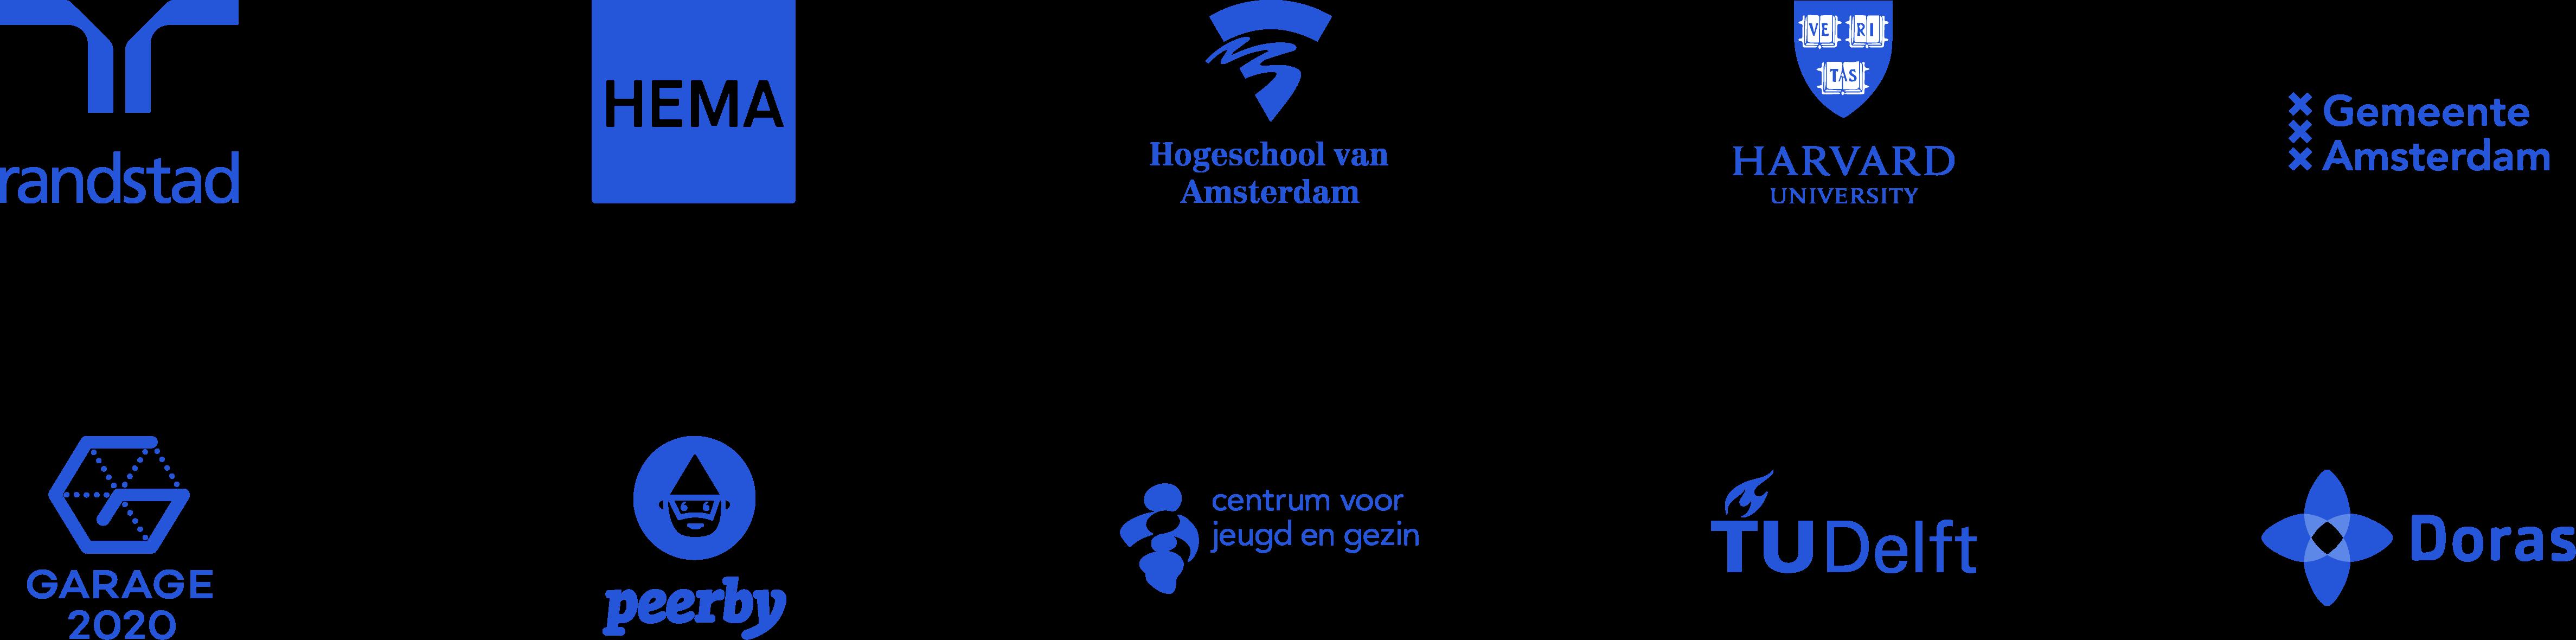 ink partner logos, randstad, hema, hogeschool van amsterdam, harvard, gemeente amsterdam, garage2020, peerby, cjg, tudelft, doras